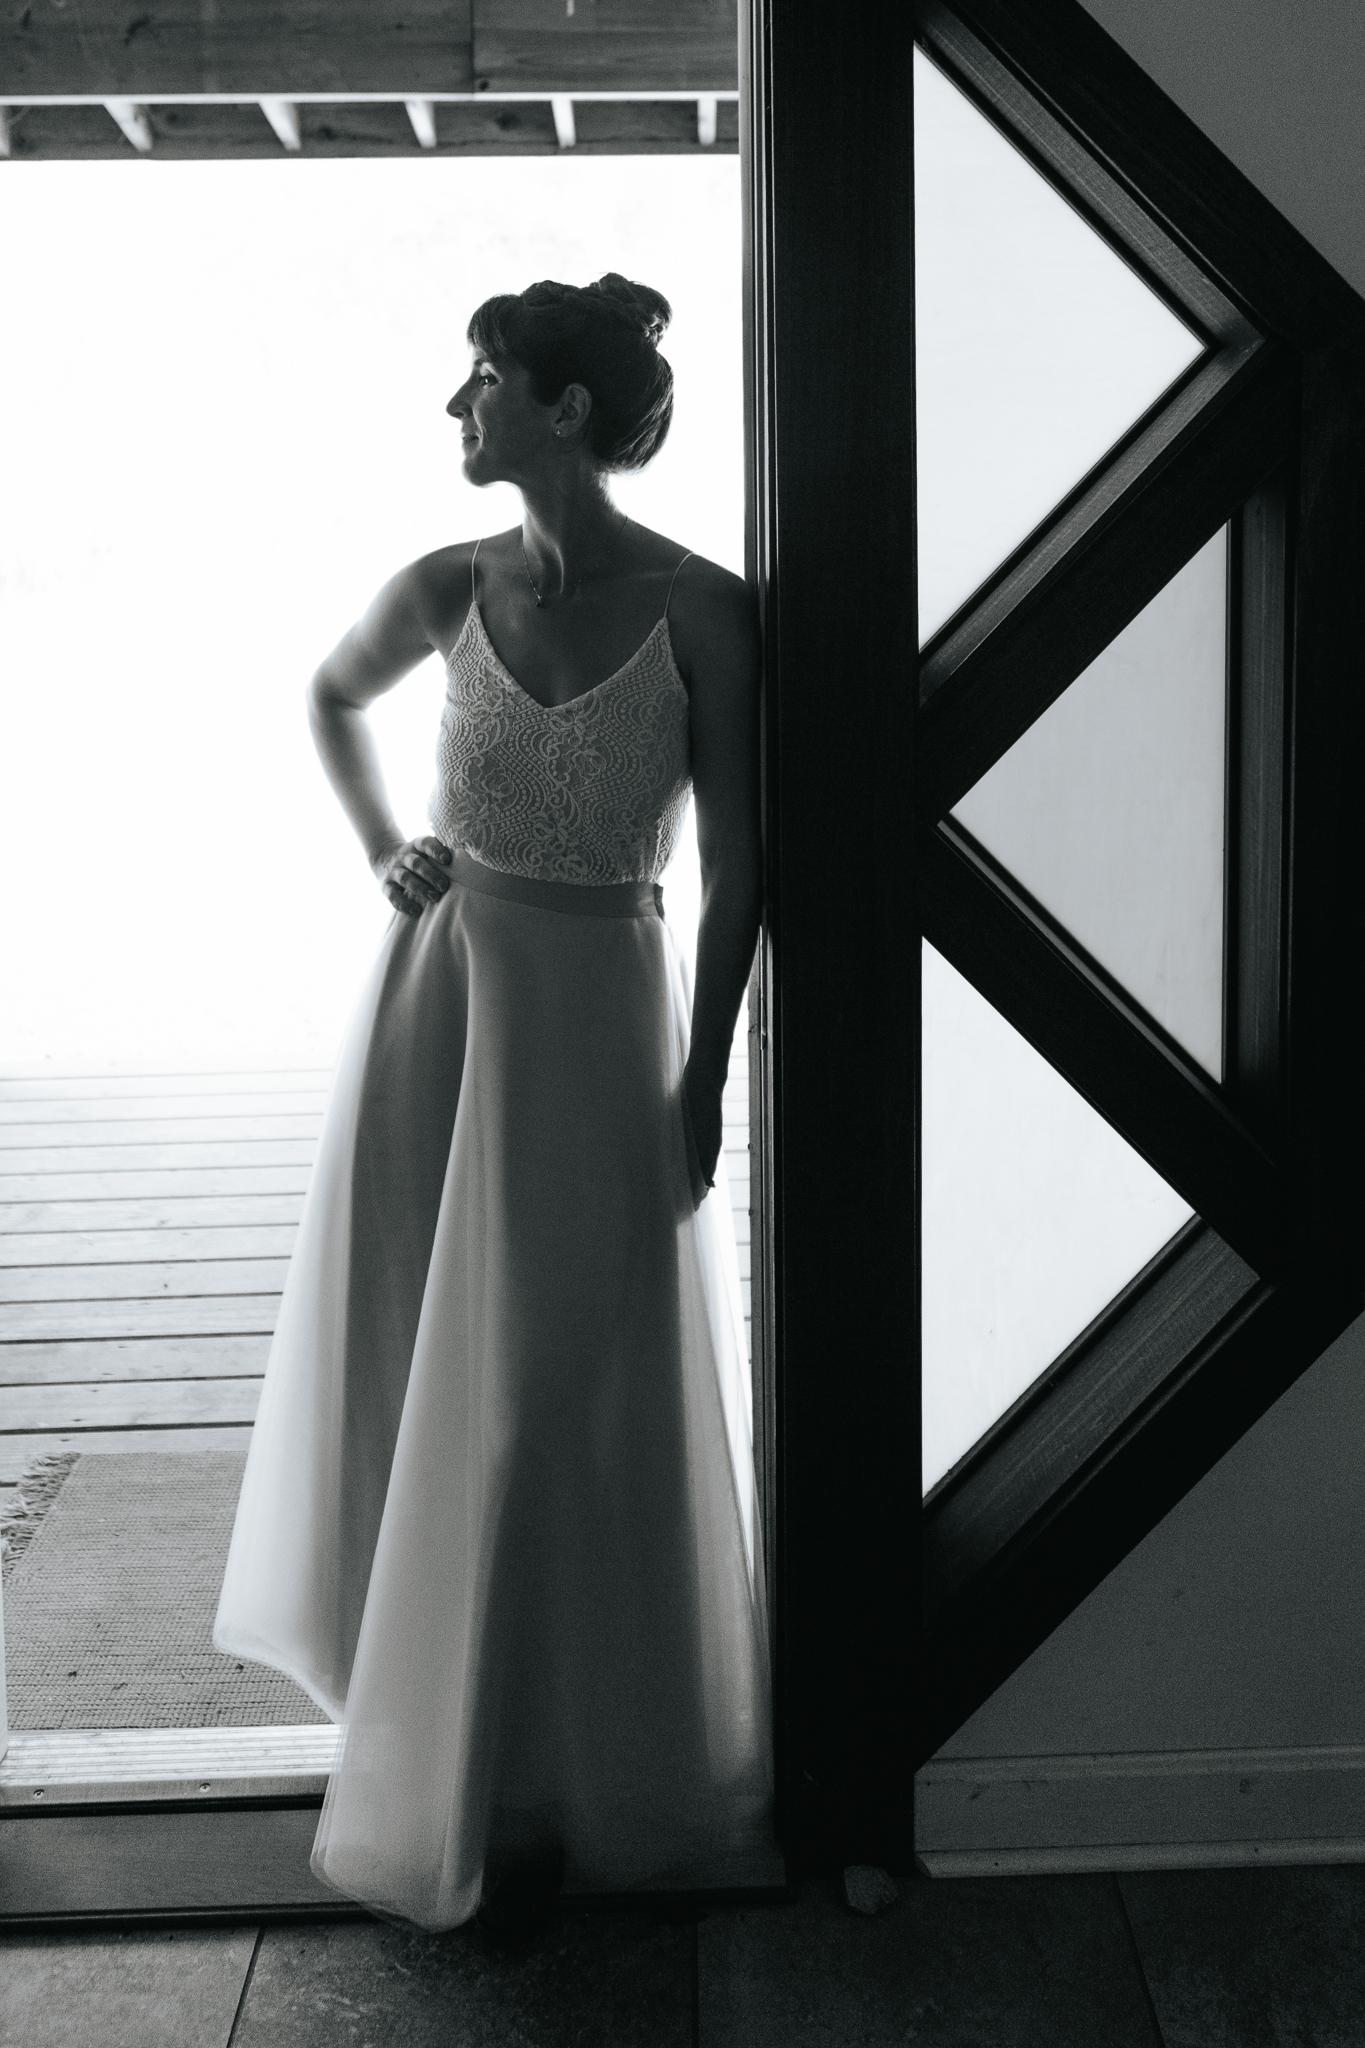 Richmond Kentucky Wedding Photographer - Ariana Jordan Photography -28-2.jpg